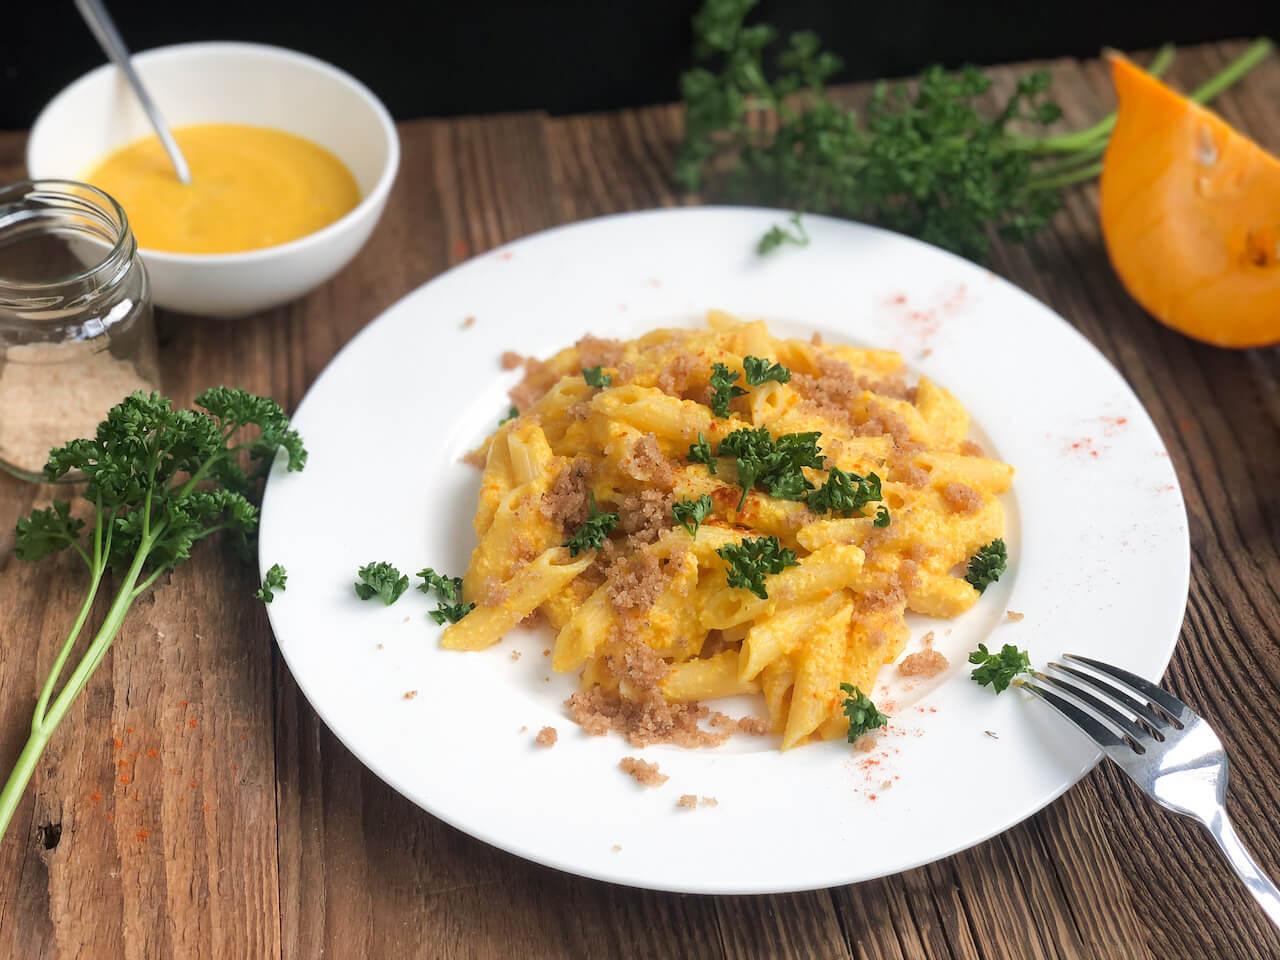 Panista_Blog_Rezept_Gliutenfreie Kürbis Mac N'Cheese